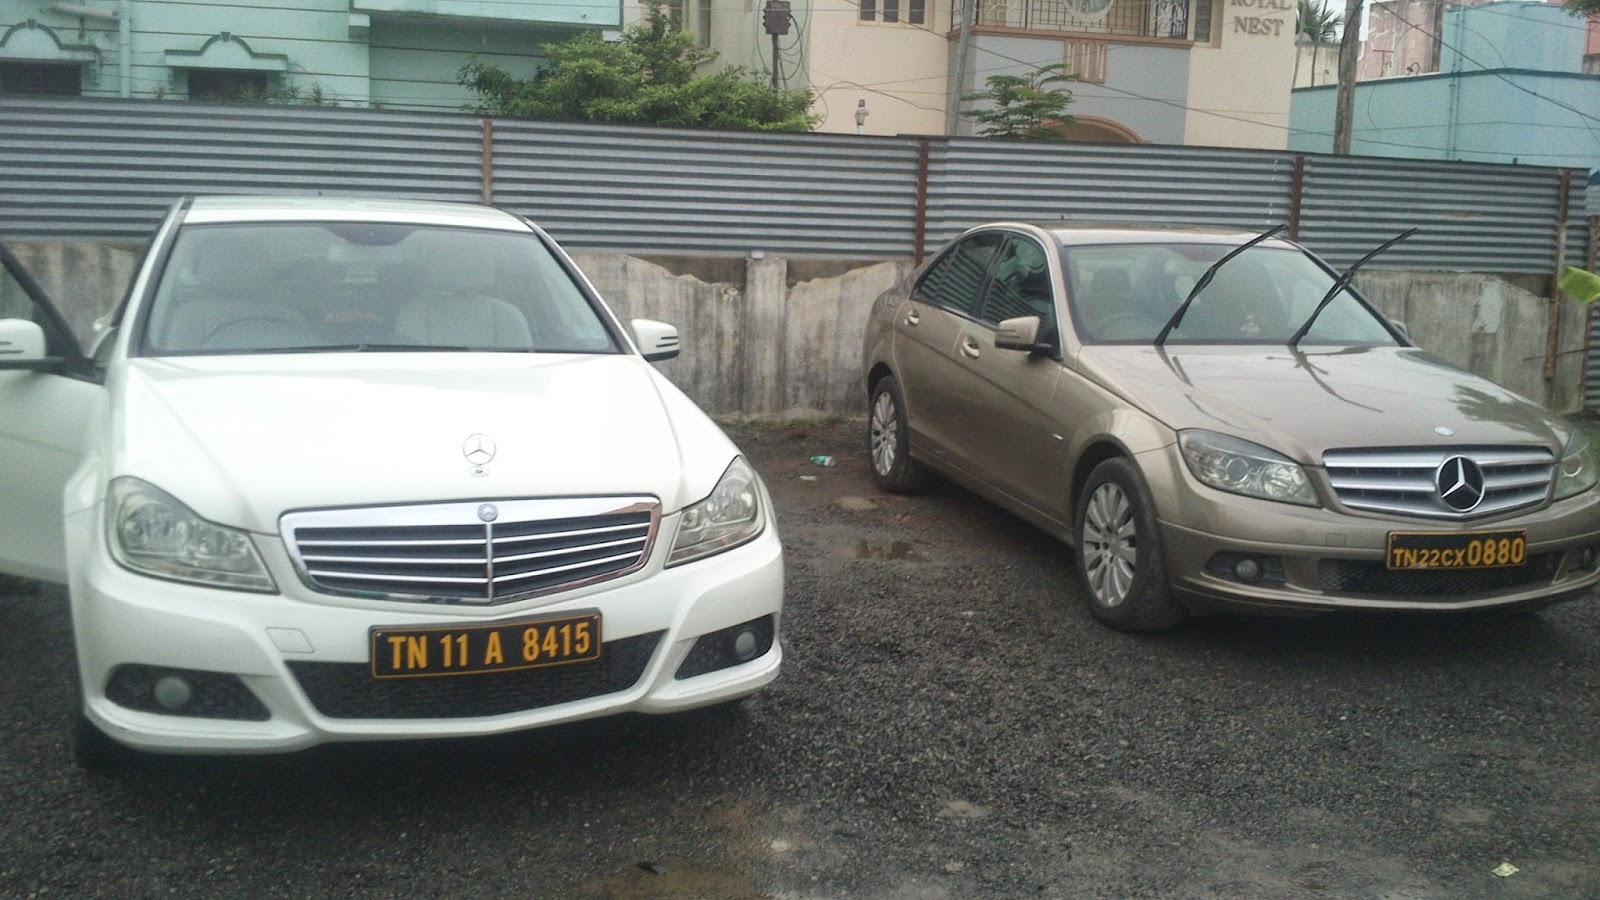 Design car number plates india - Mercedes Benz C Class Self Drive Experience Carzonrent Chennai